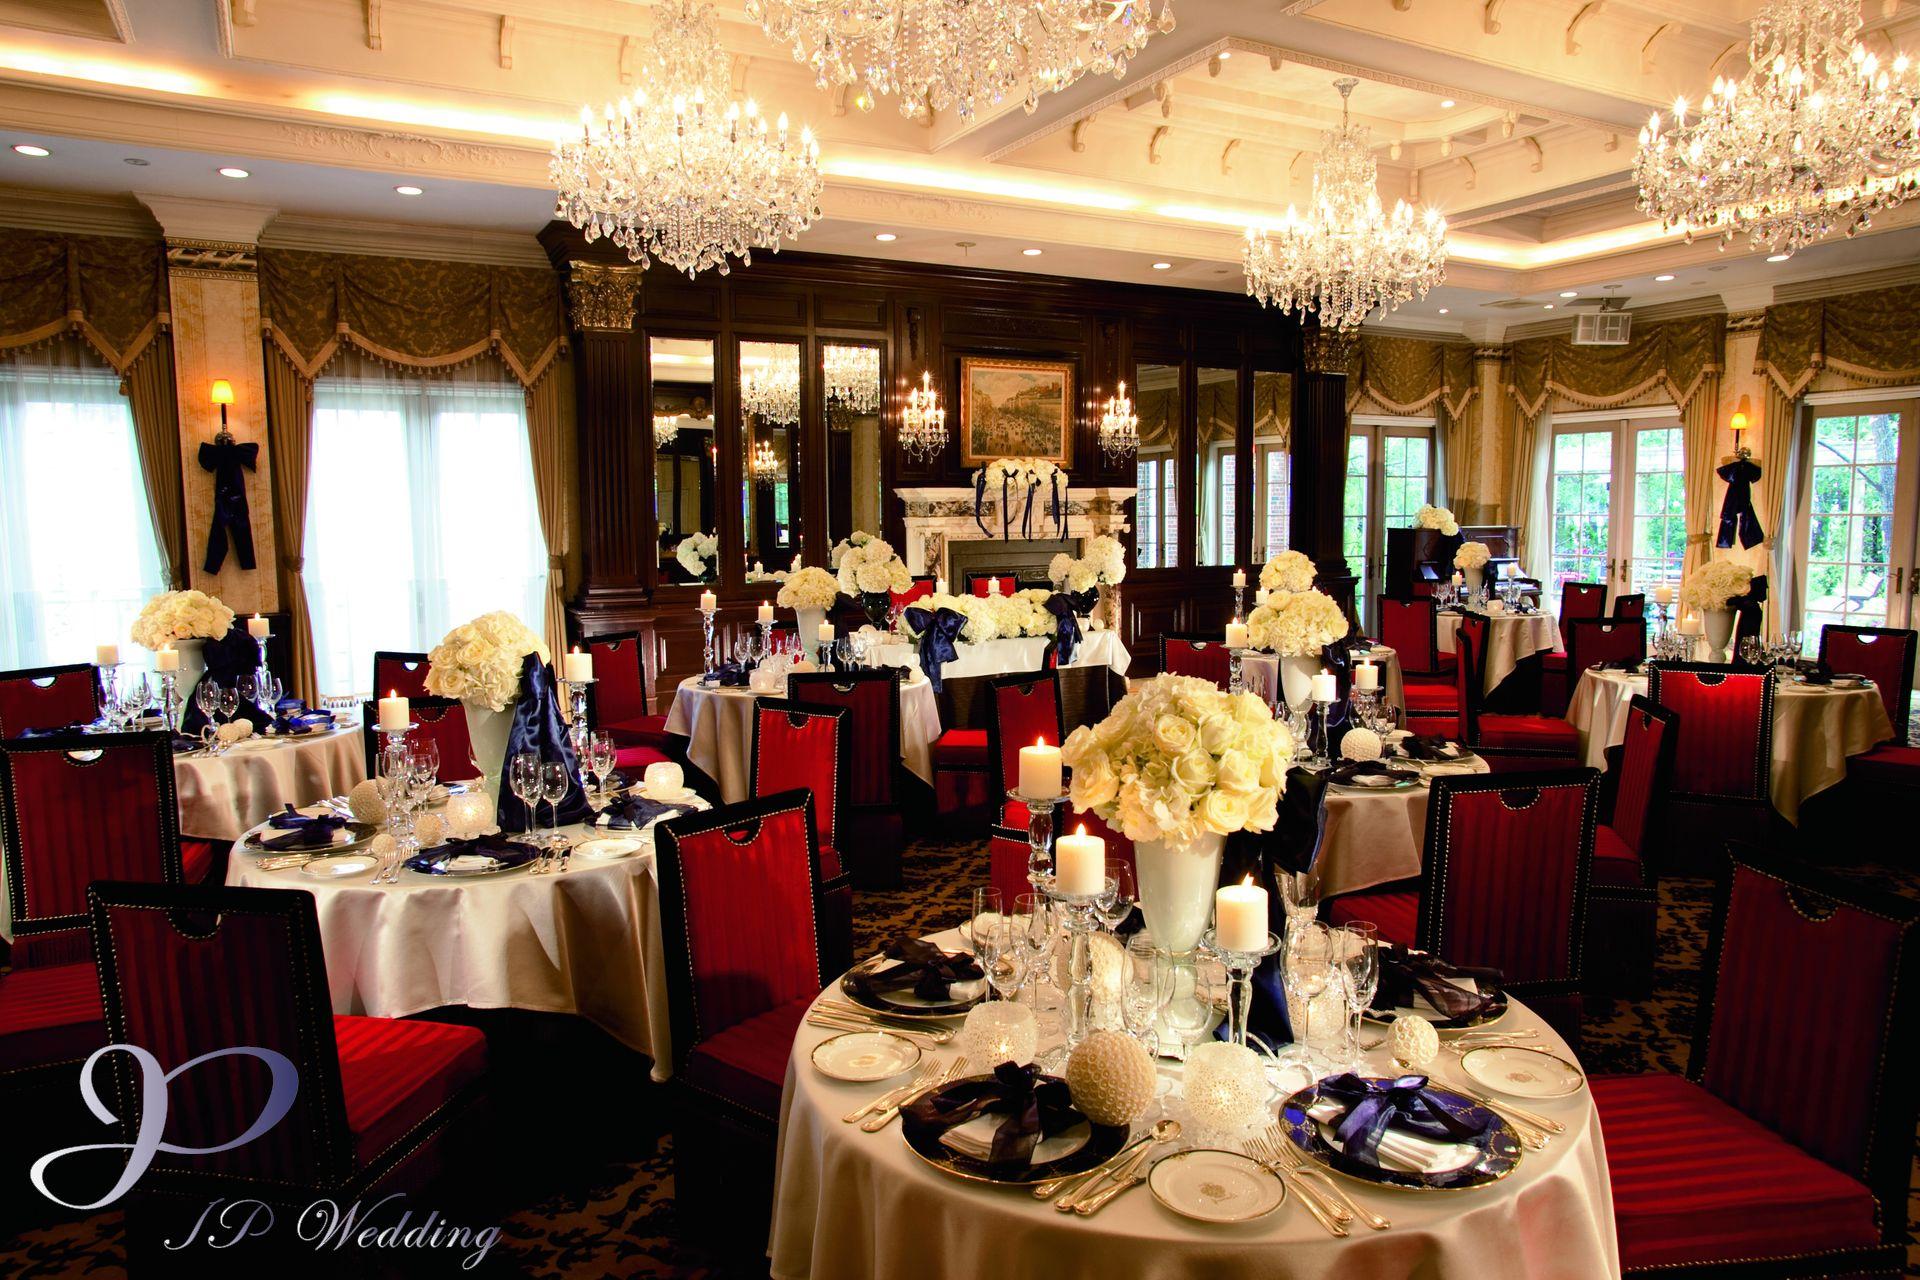 jp wedding日本婚宴廳.濃厚英倫氣氛